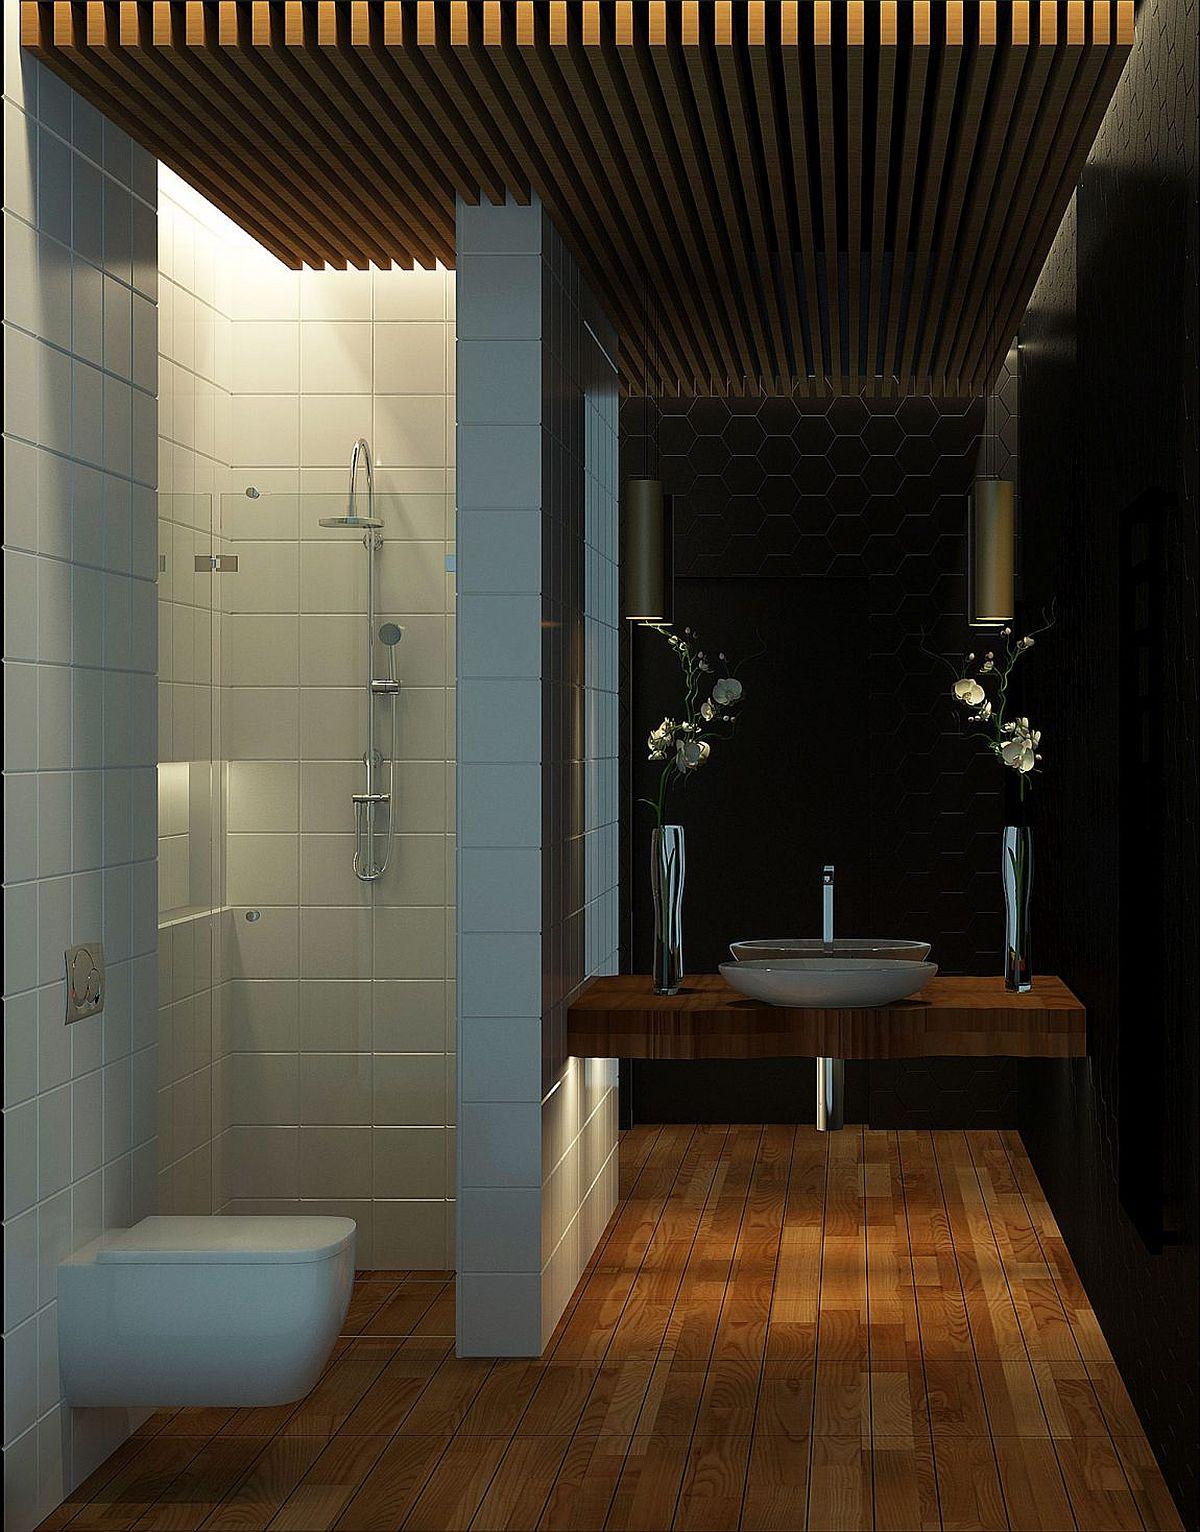 Dark hexagonal tiles bring geo style to the bathroom